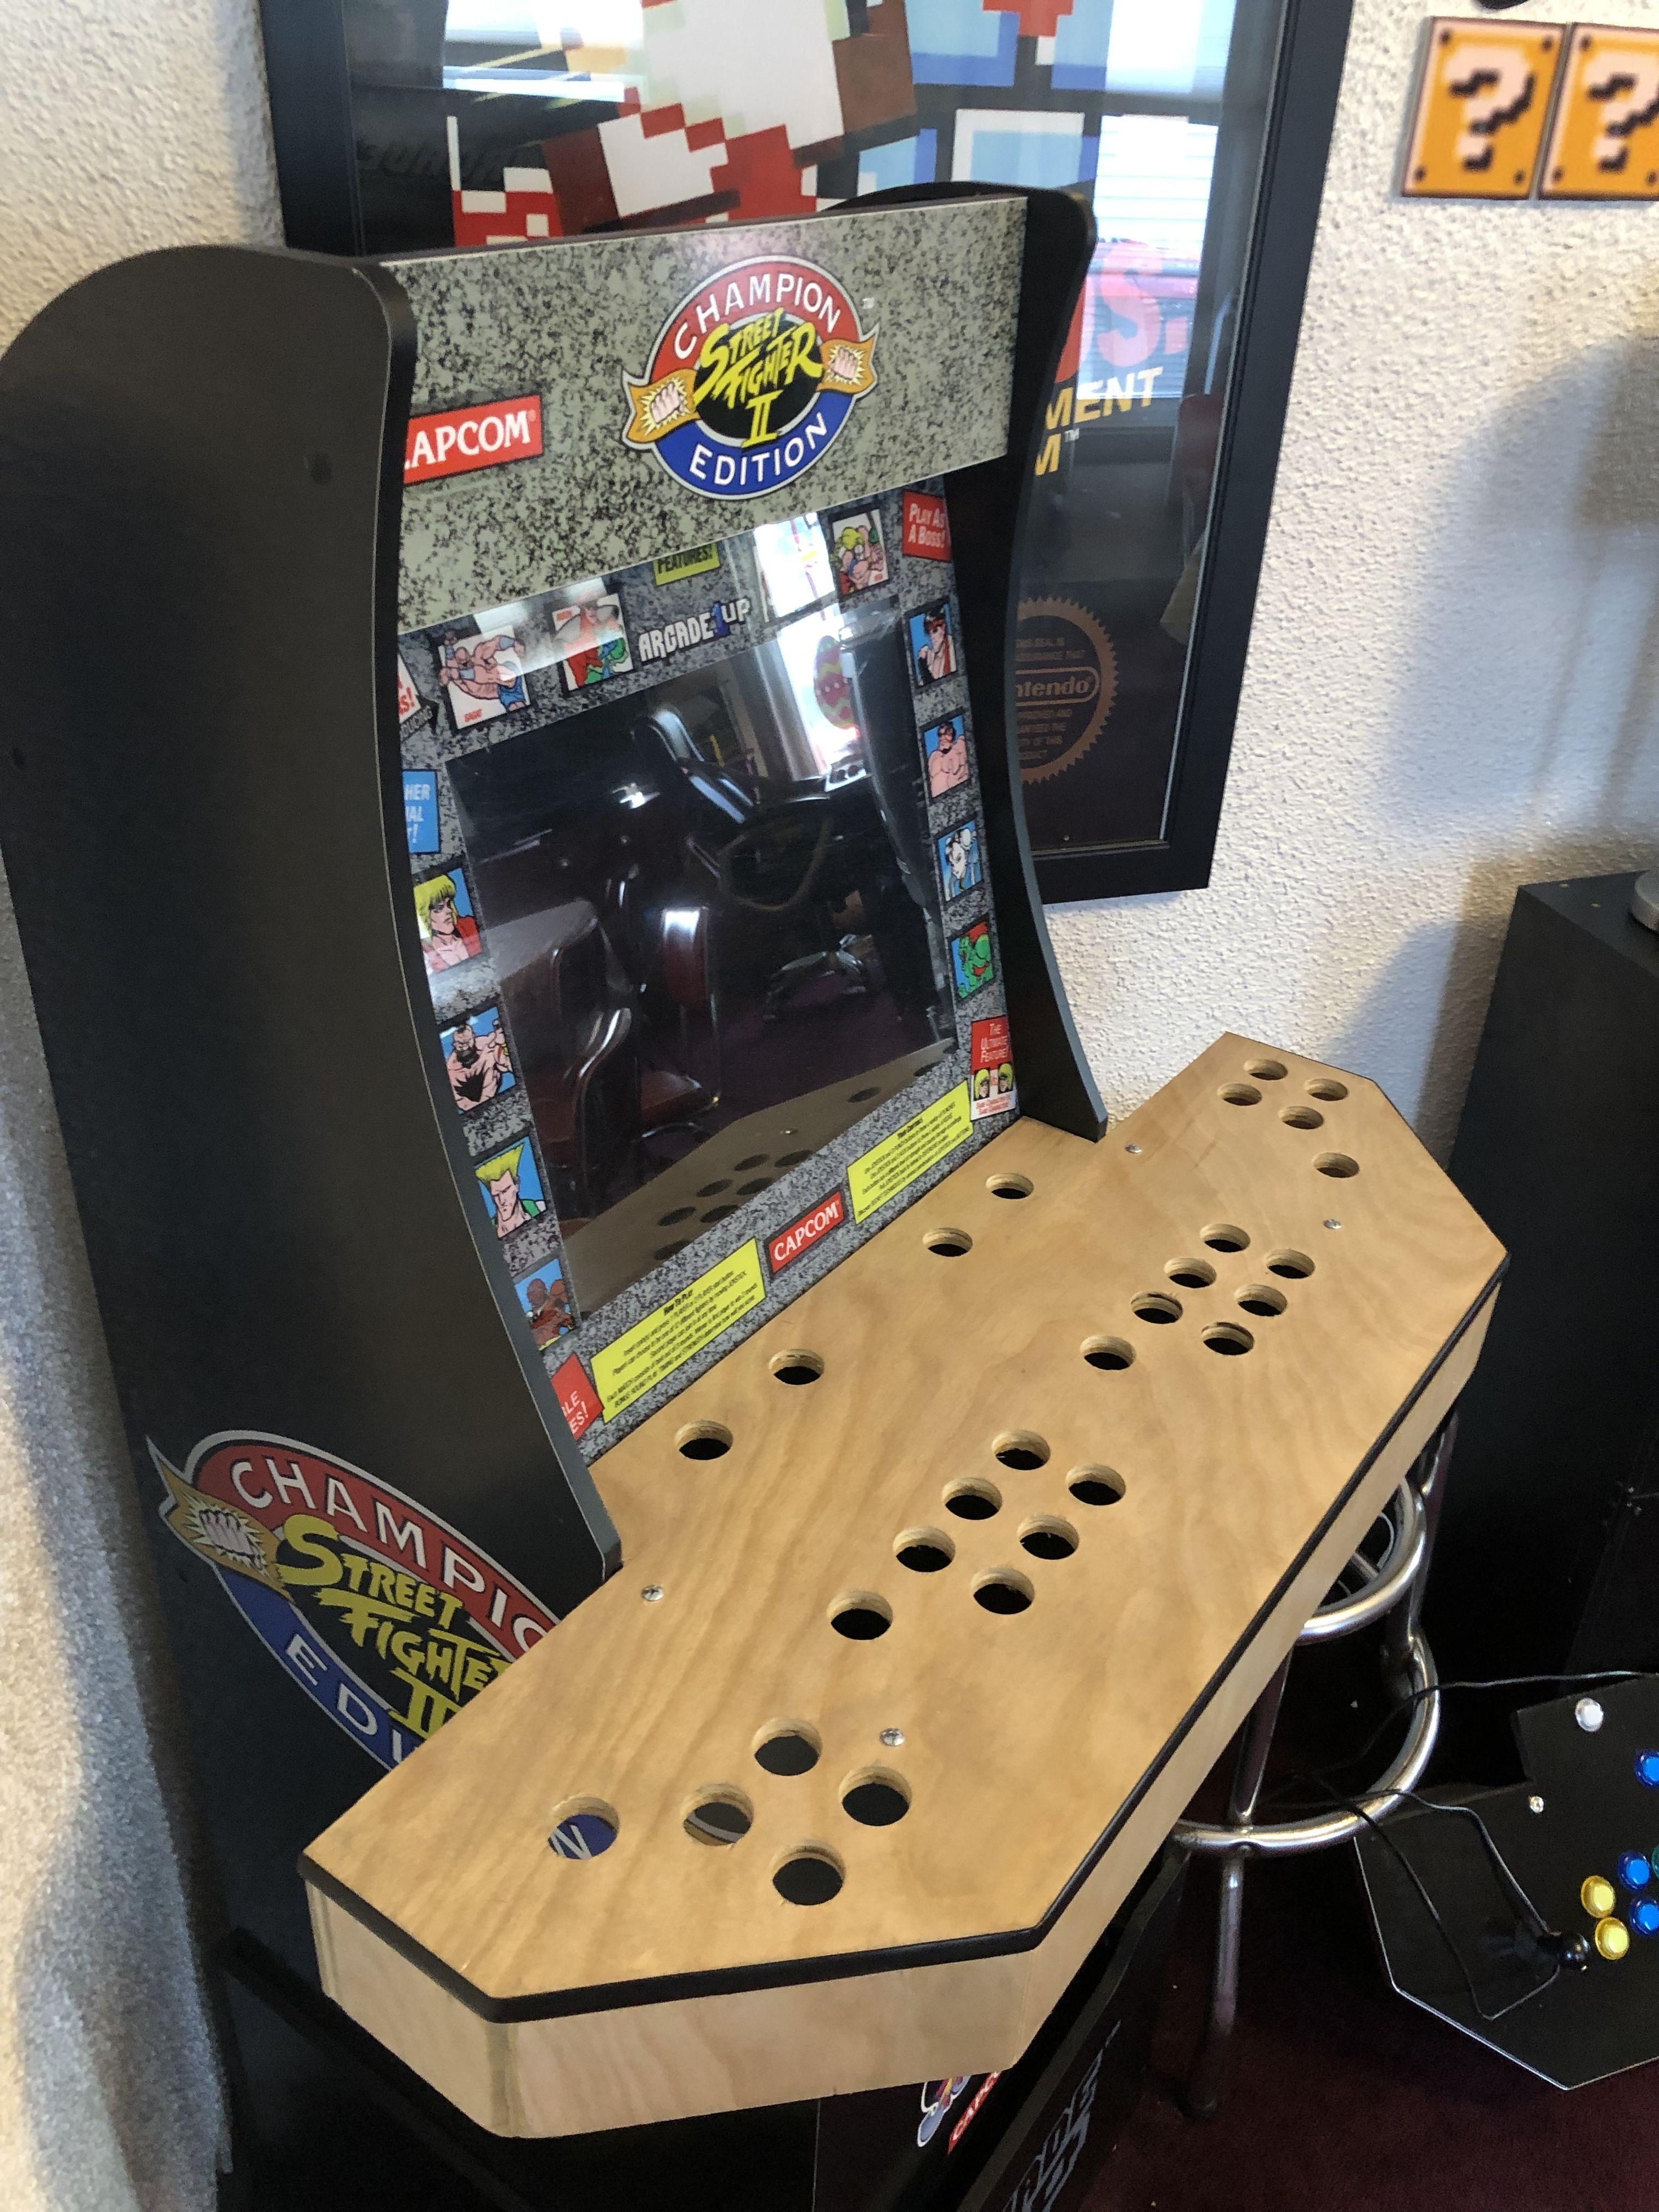 4 player control panel | Arcade1up-grades | Arcade control